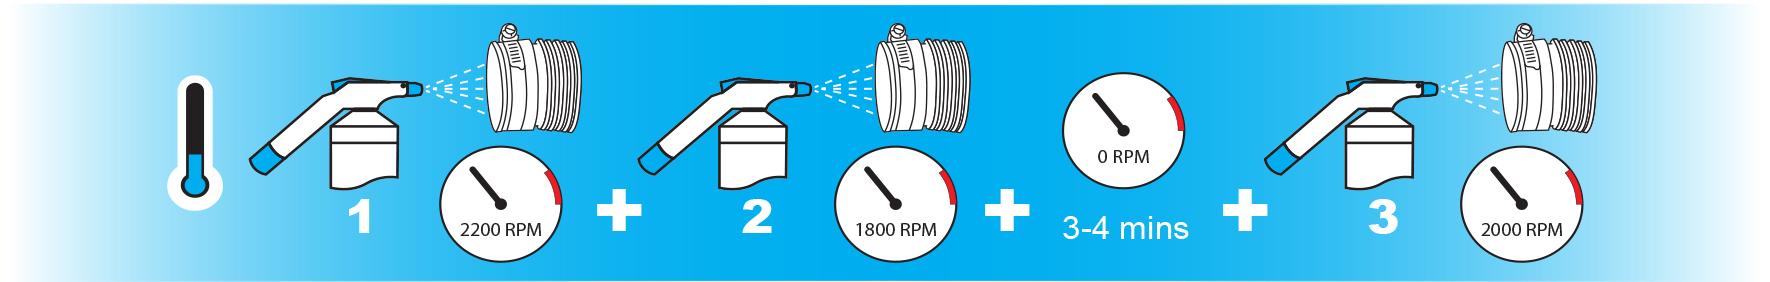 Sprayer-measurements.jpg